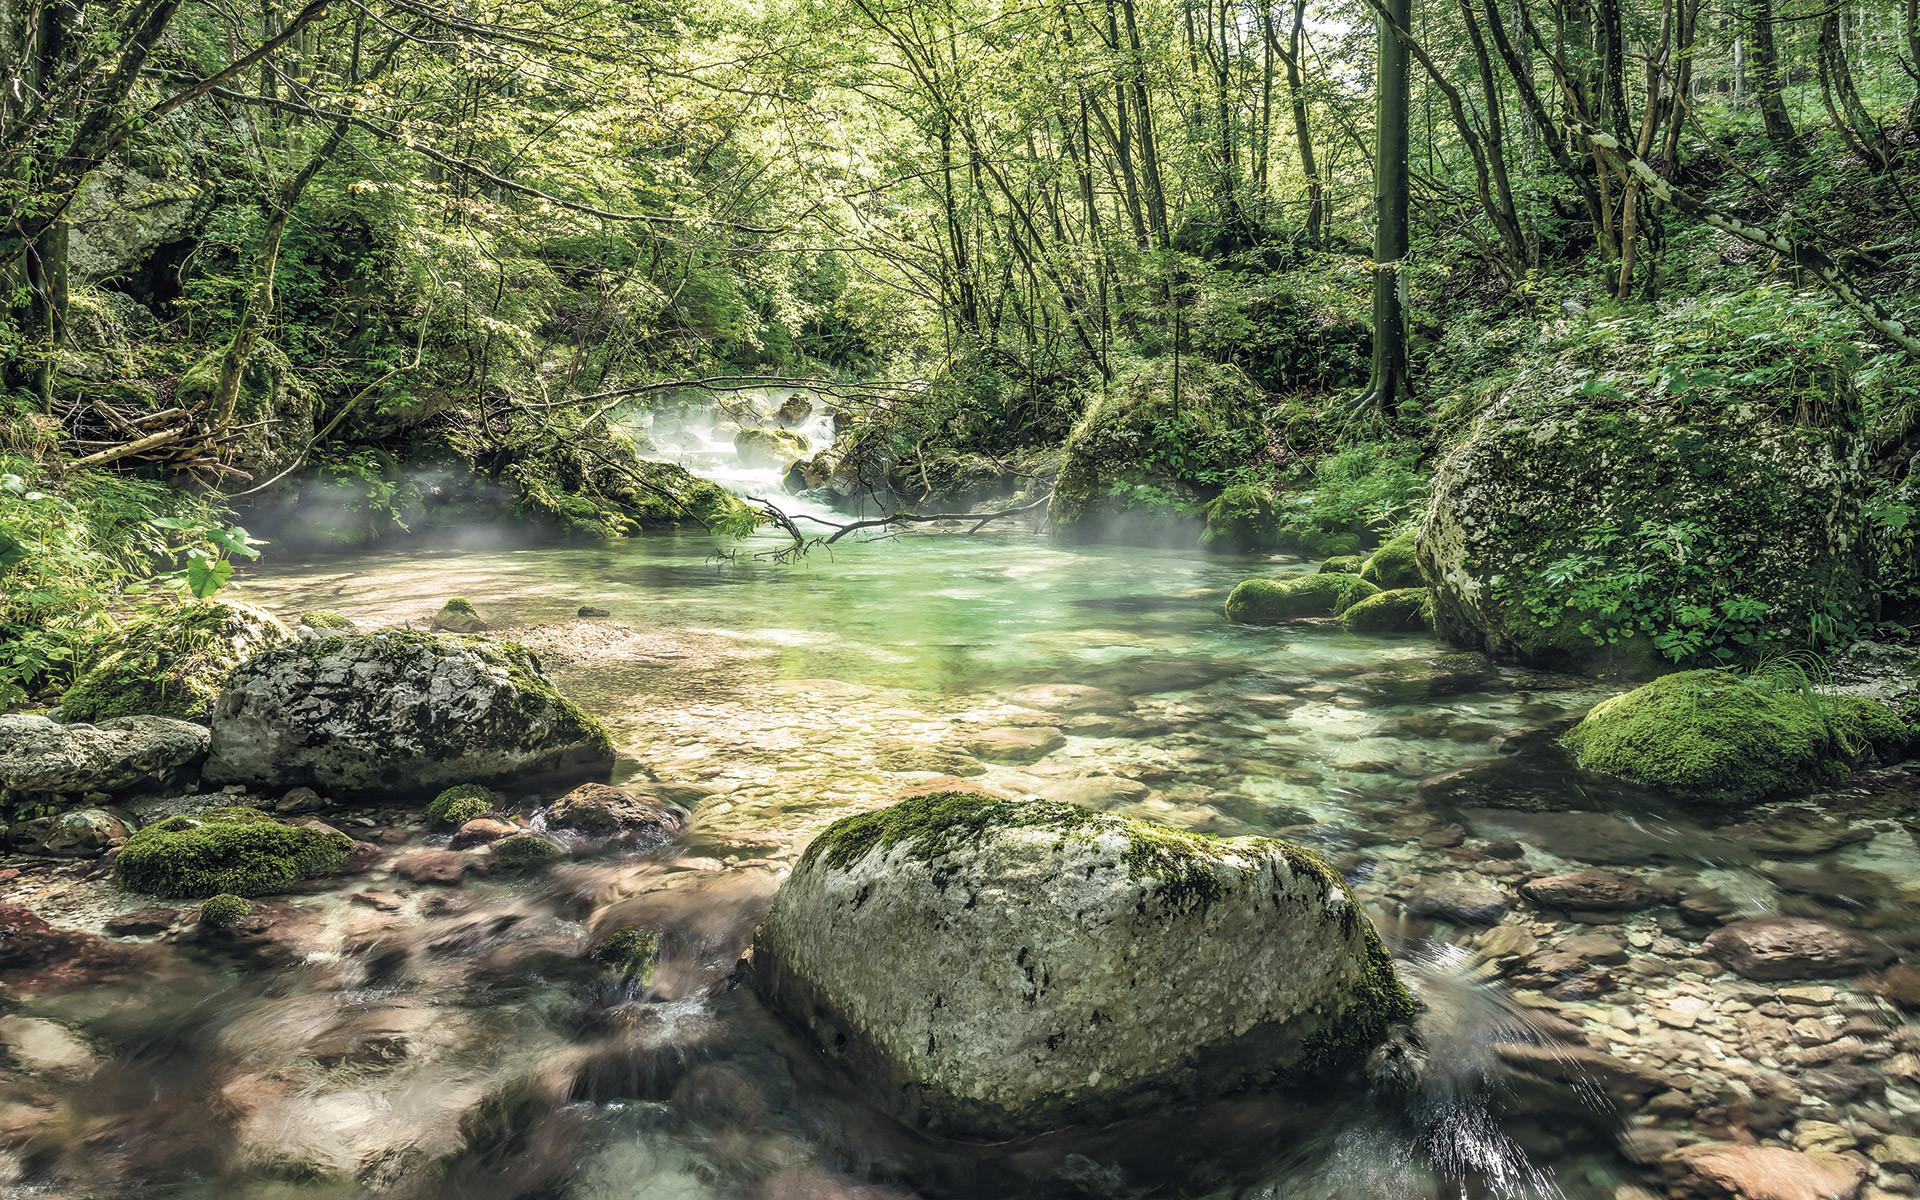 Fototapete auf Vlies Tranquil Pool von Stefan Hefele  fototapetede